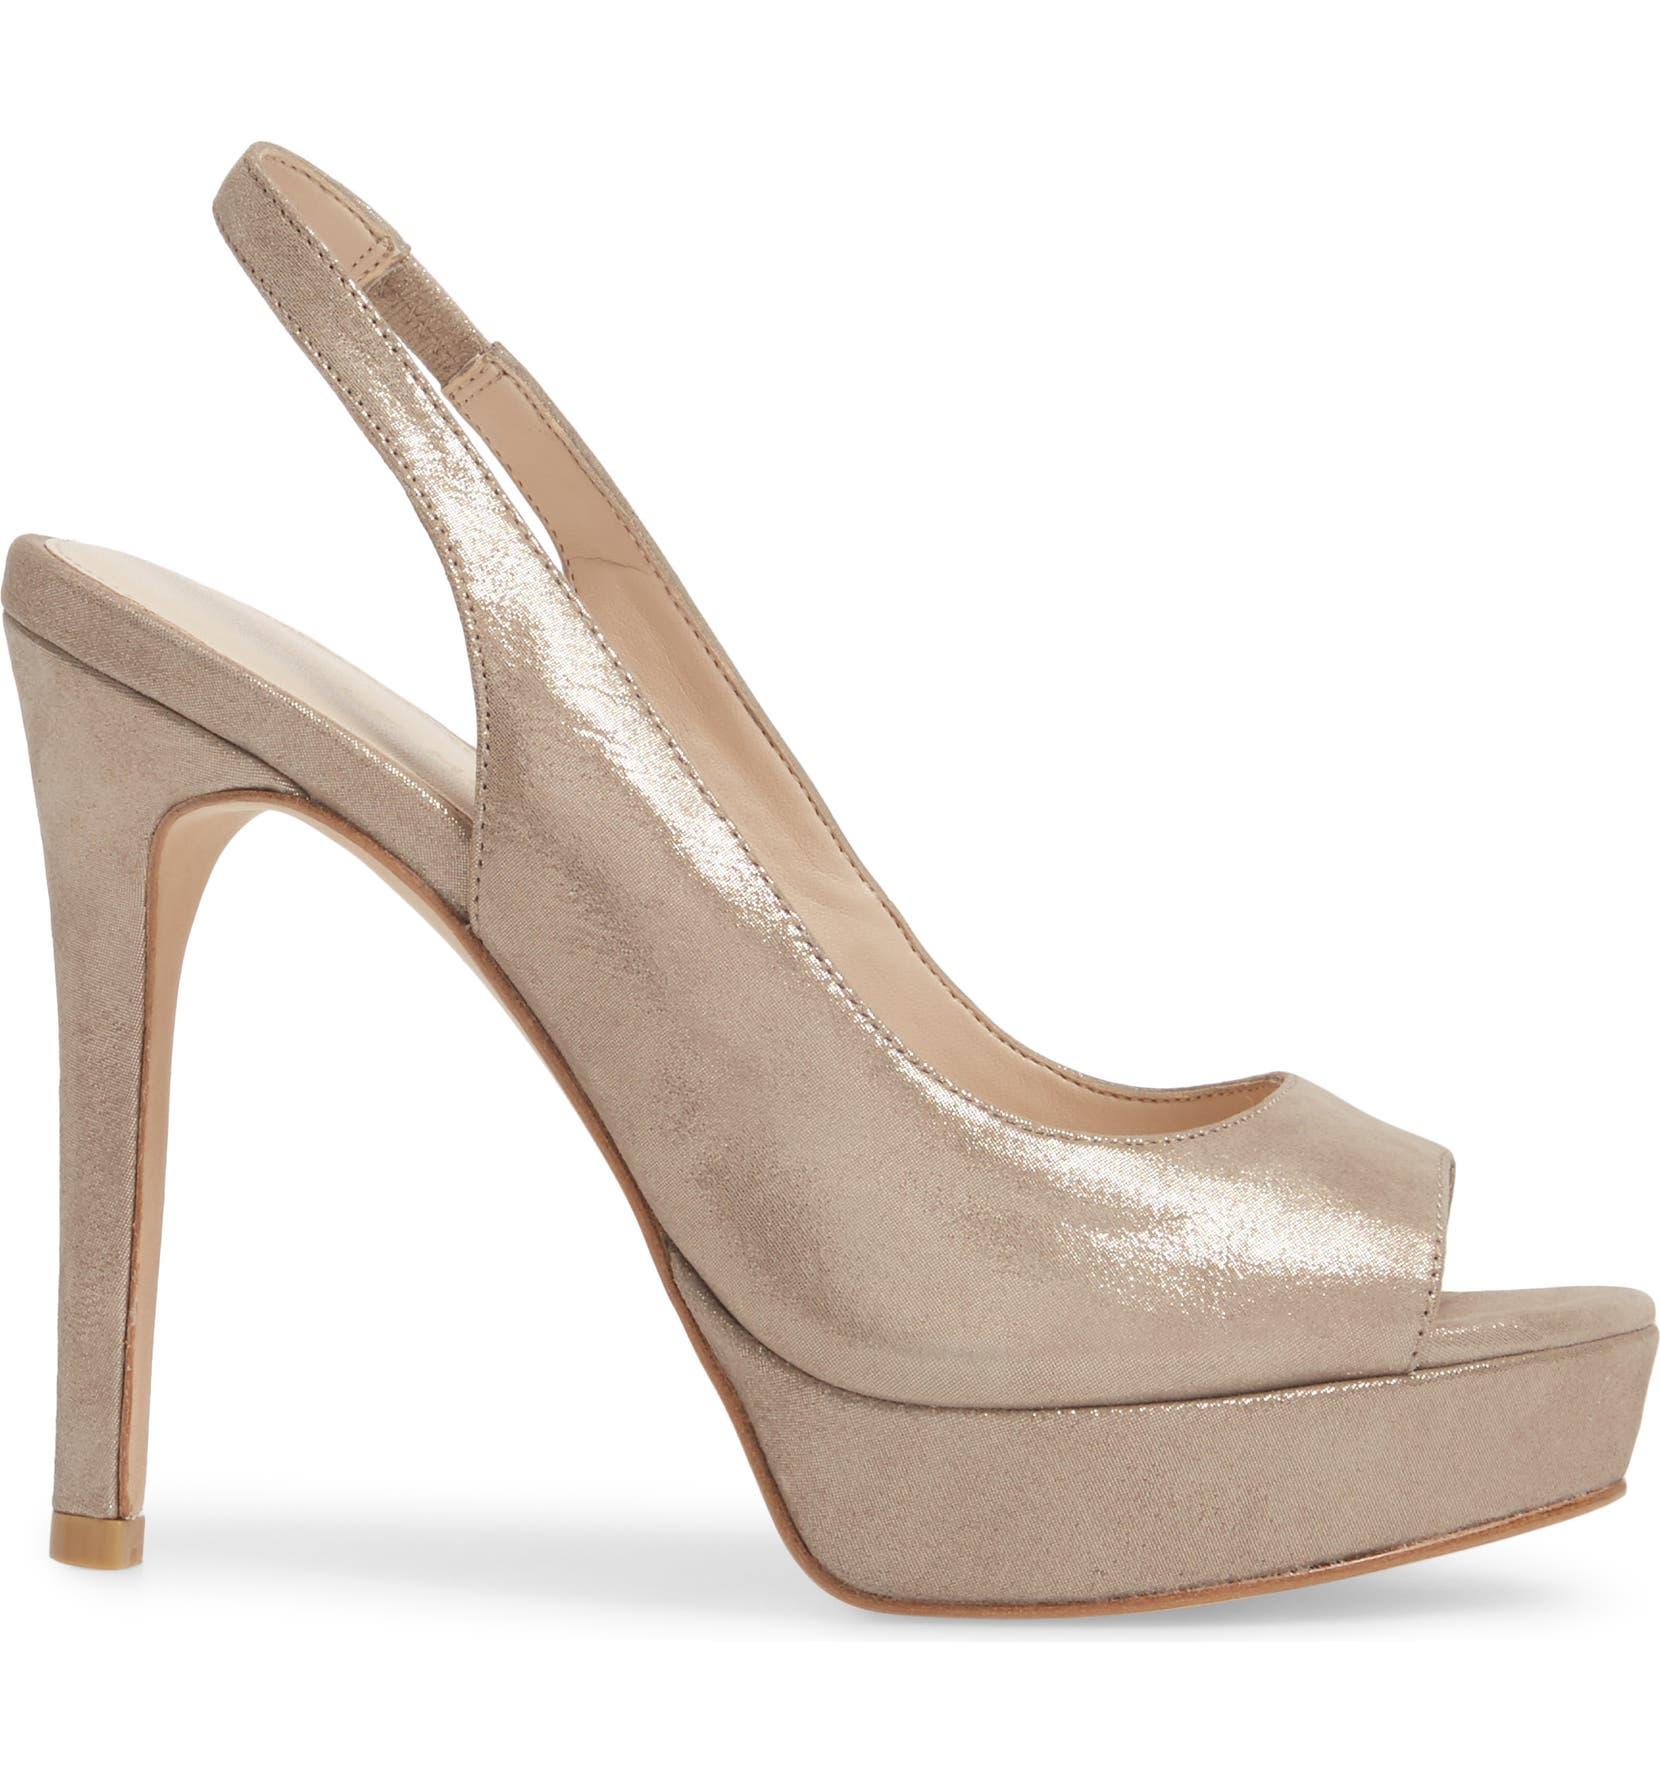 344bba7aff1f Pelle Moda Oana Slingback Platform Sandal (Women)